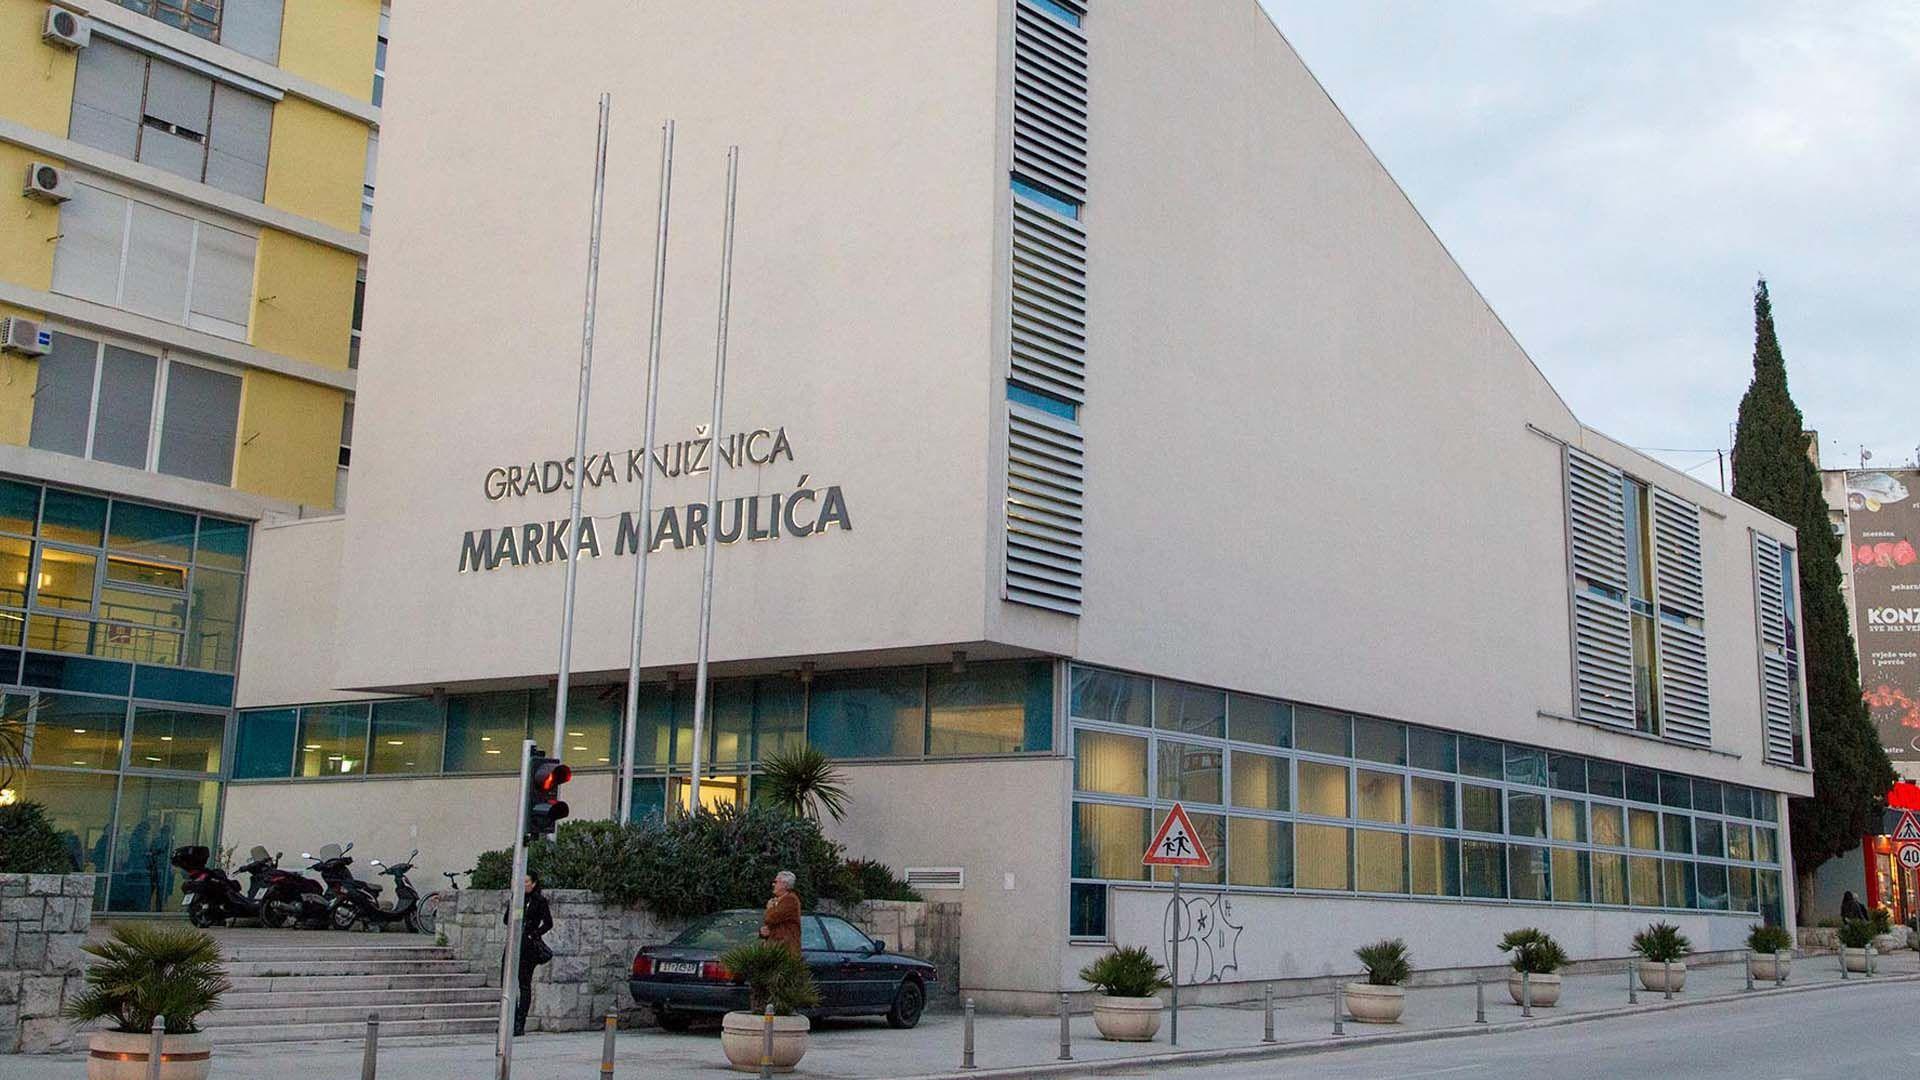 Predstavljanje Knjige Moderni Budizam U Splitu Apoliticni Multi Story Building Building Structures